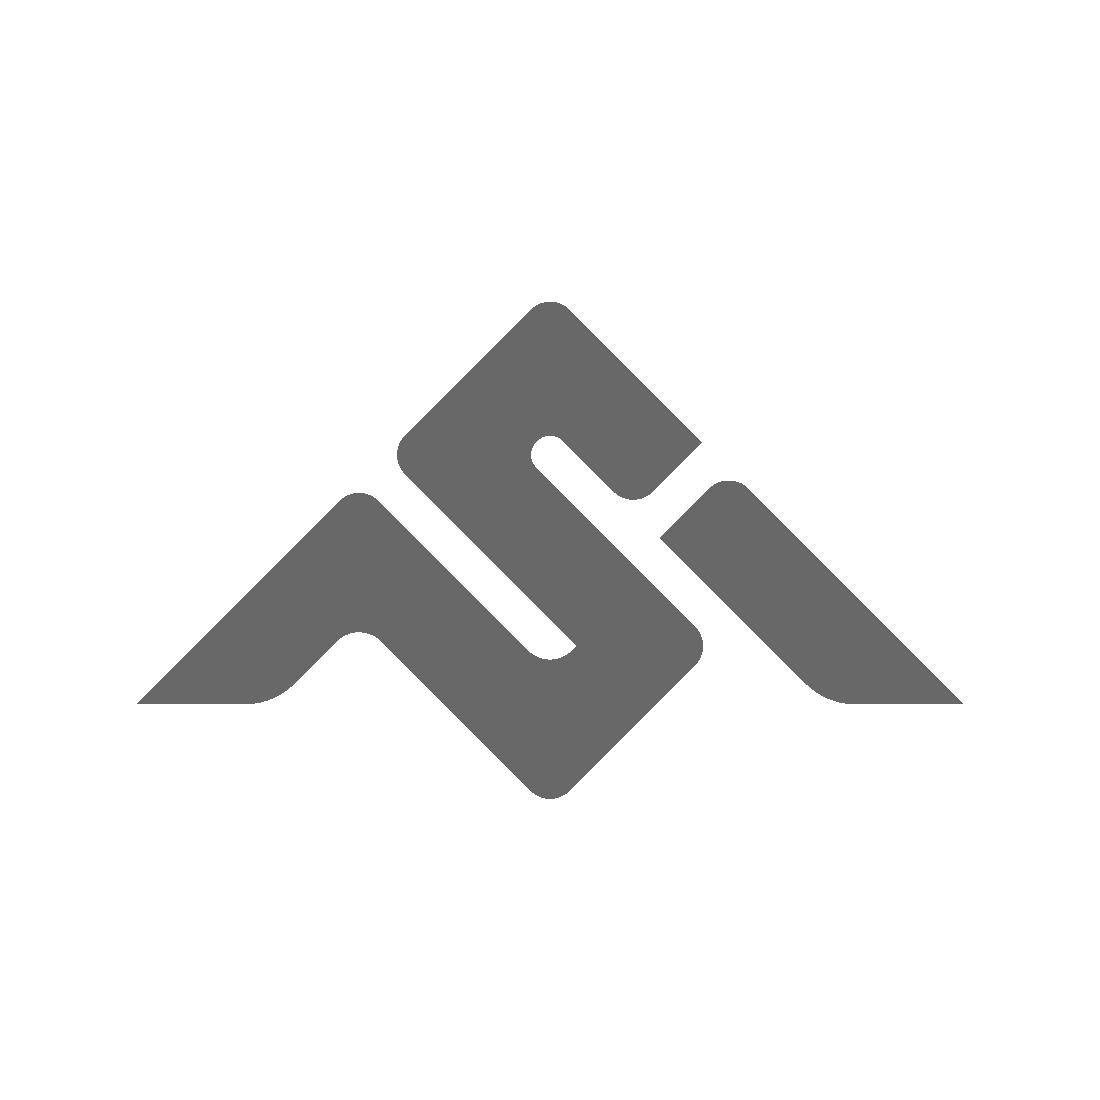 Jart Skateboard Deck XDXDXD HC CFK 8.125 Skateboard Deck